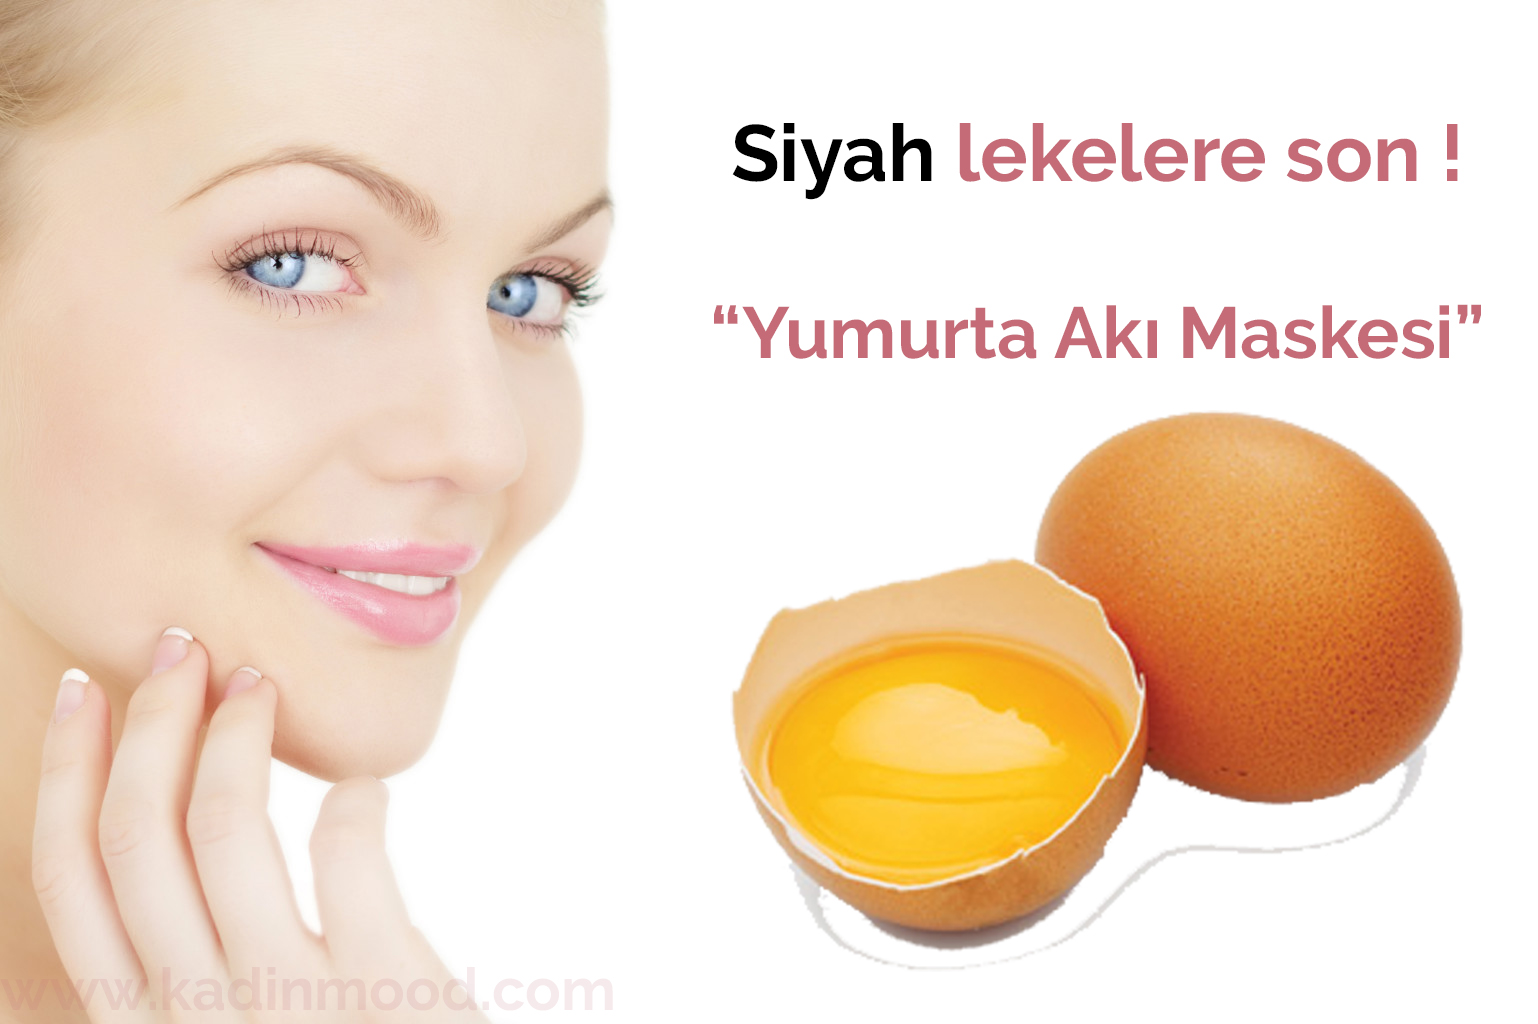 Yumurta akı maskesi tarifleri